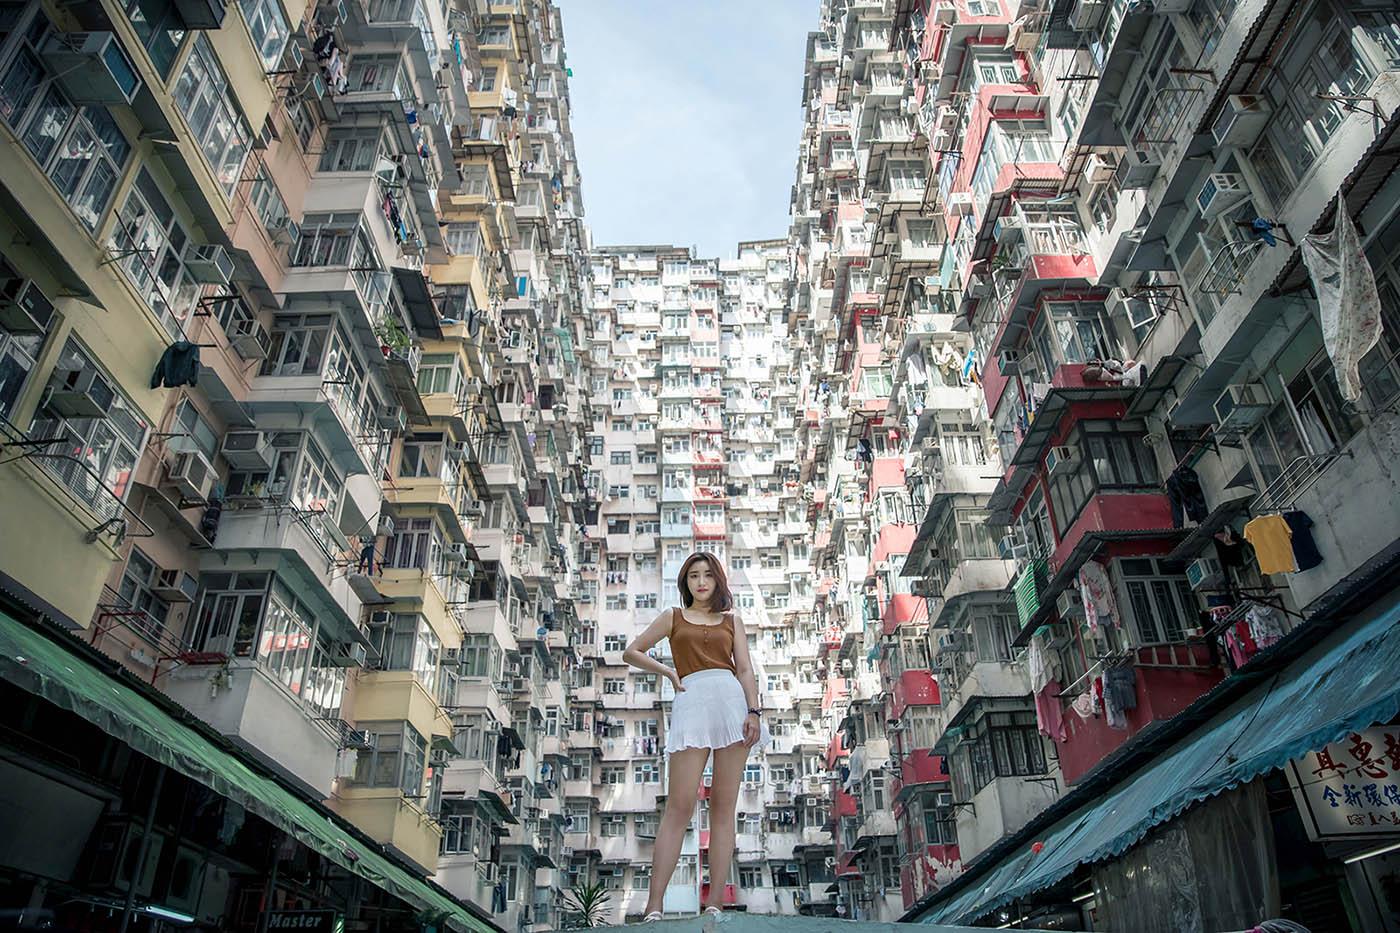 Sprazzi_Professional_Portrait_Photo_Hongkong_Kevin_Resize_10.jpg